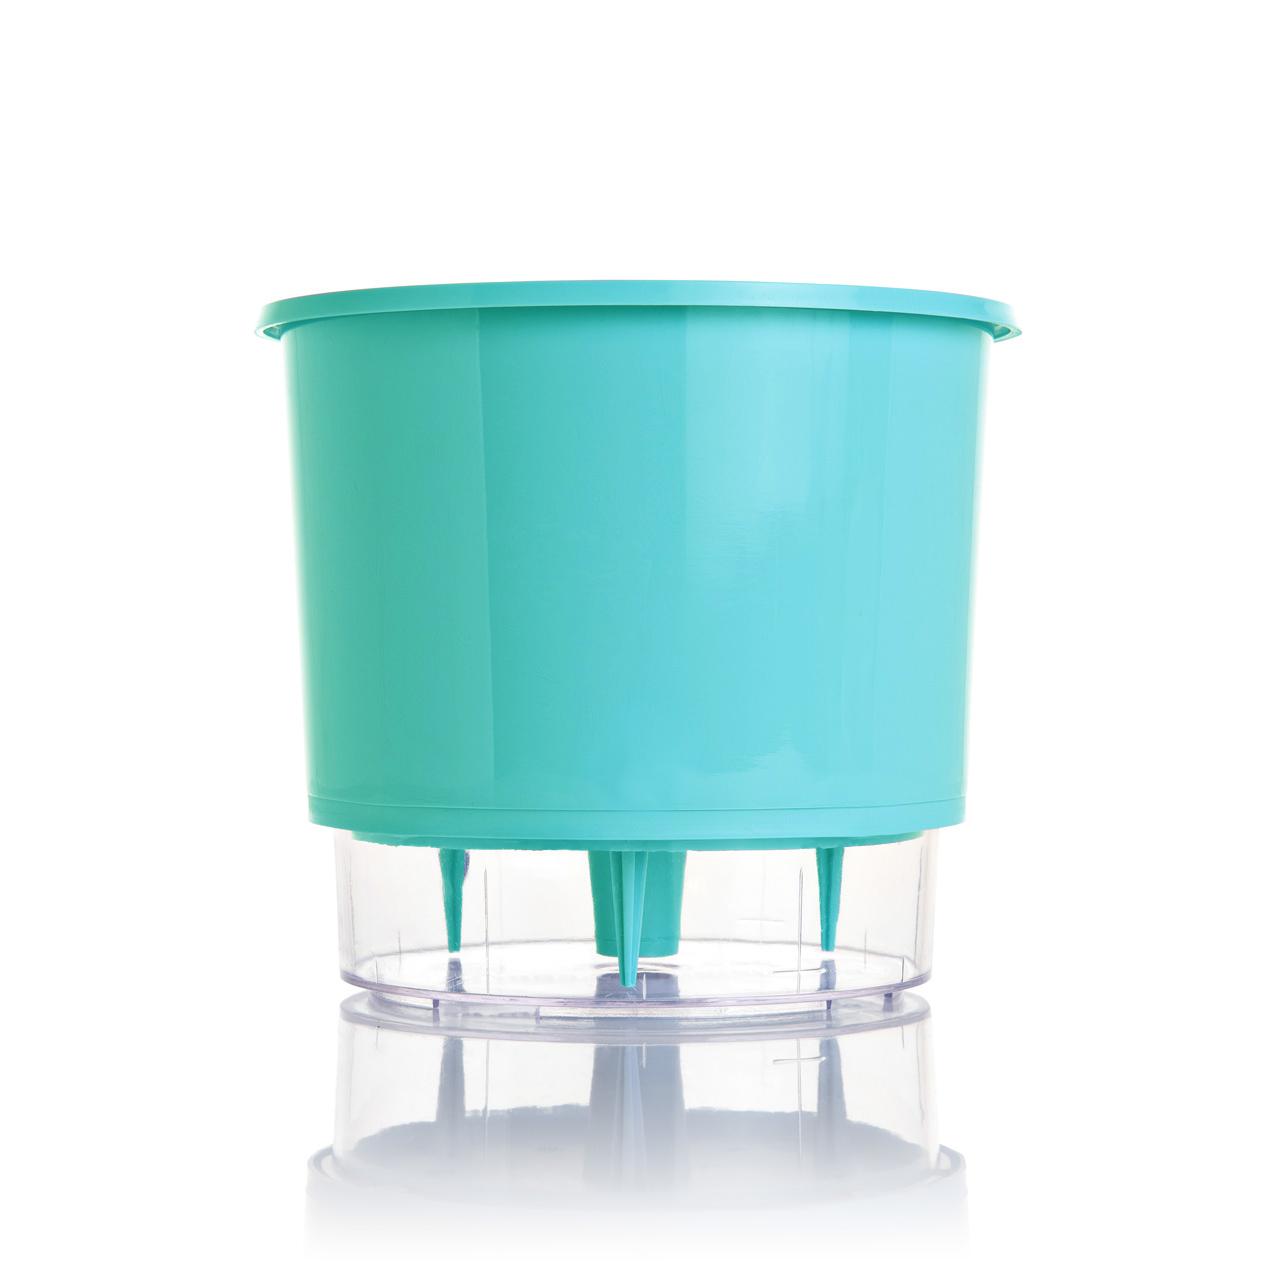 Vaso Autoirrigável Verde Raiz Pequeno 12cm x 11cm N02  - Loja Raiz